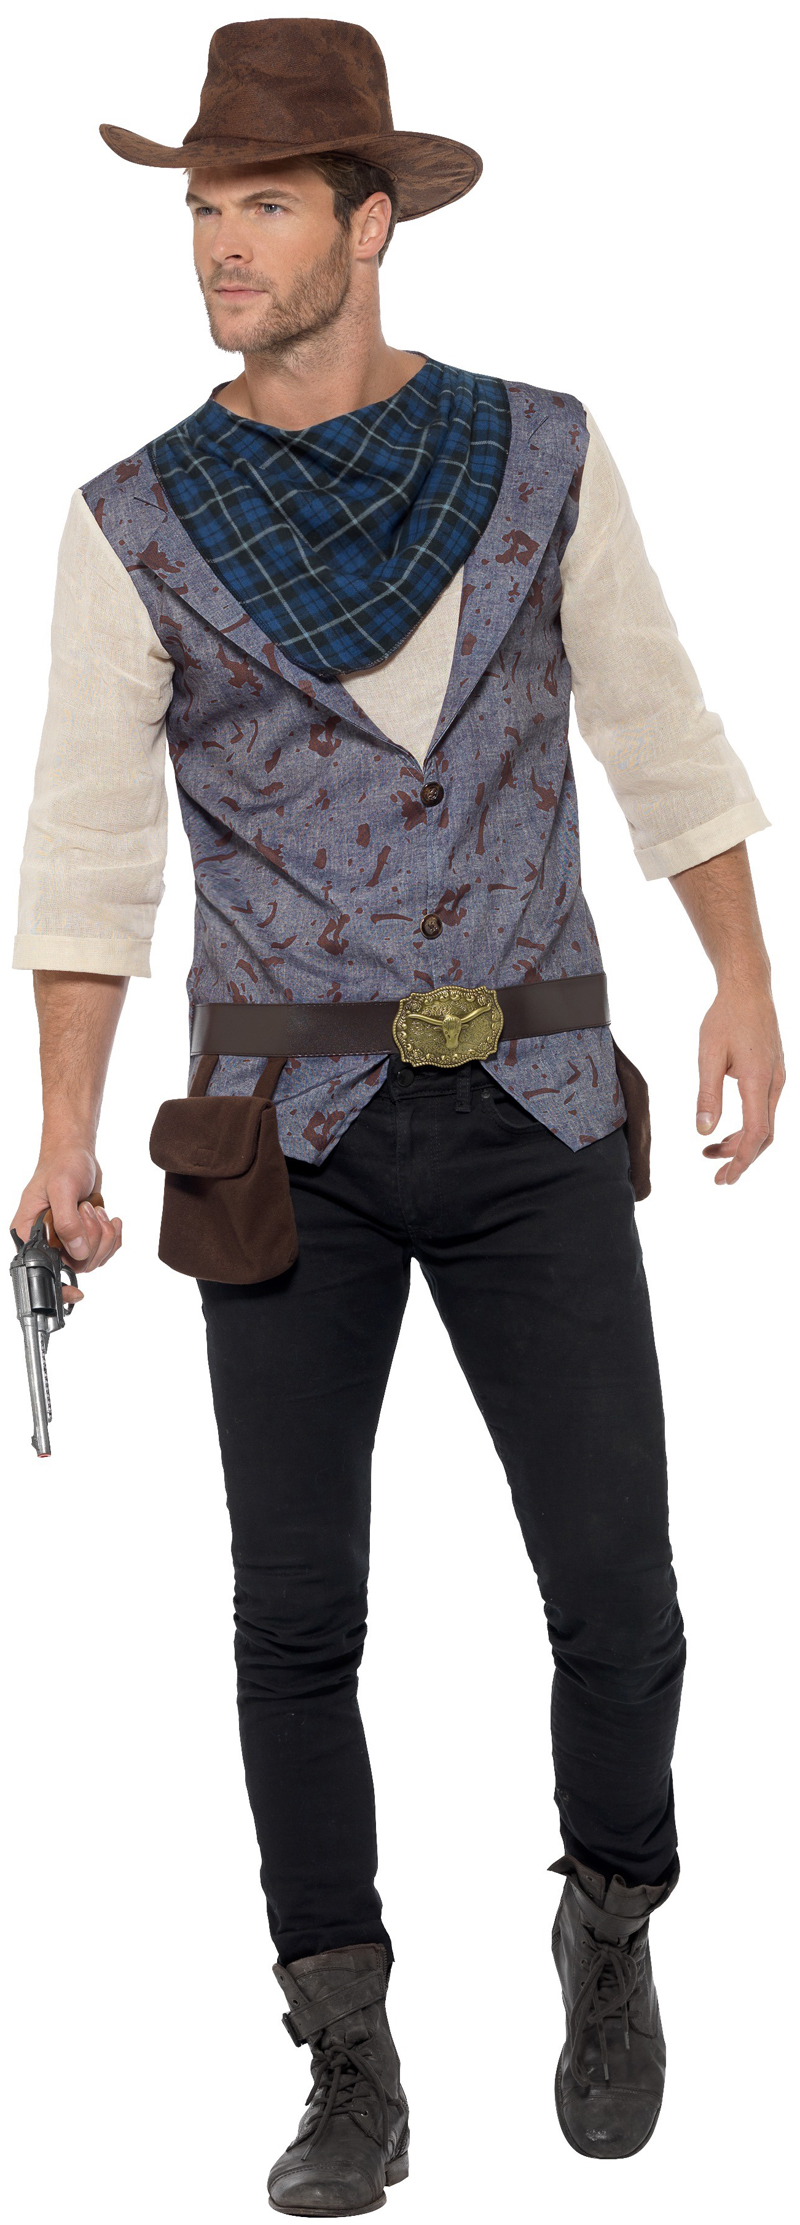 Rugged Cowboy Mens Costume  sc 1 st  Mega Fancy Dress & Rugged Cowboy Mens Costume | Letter